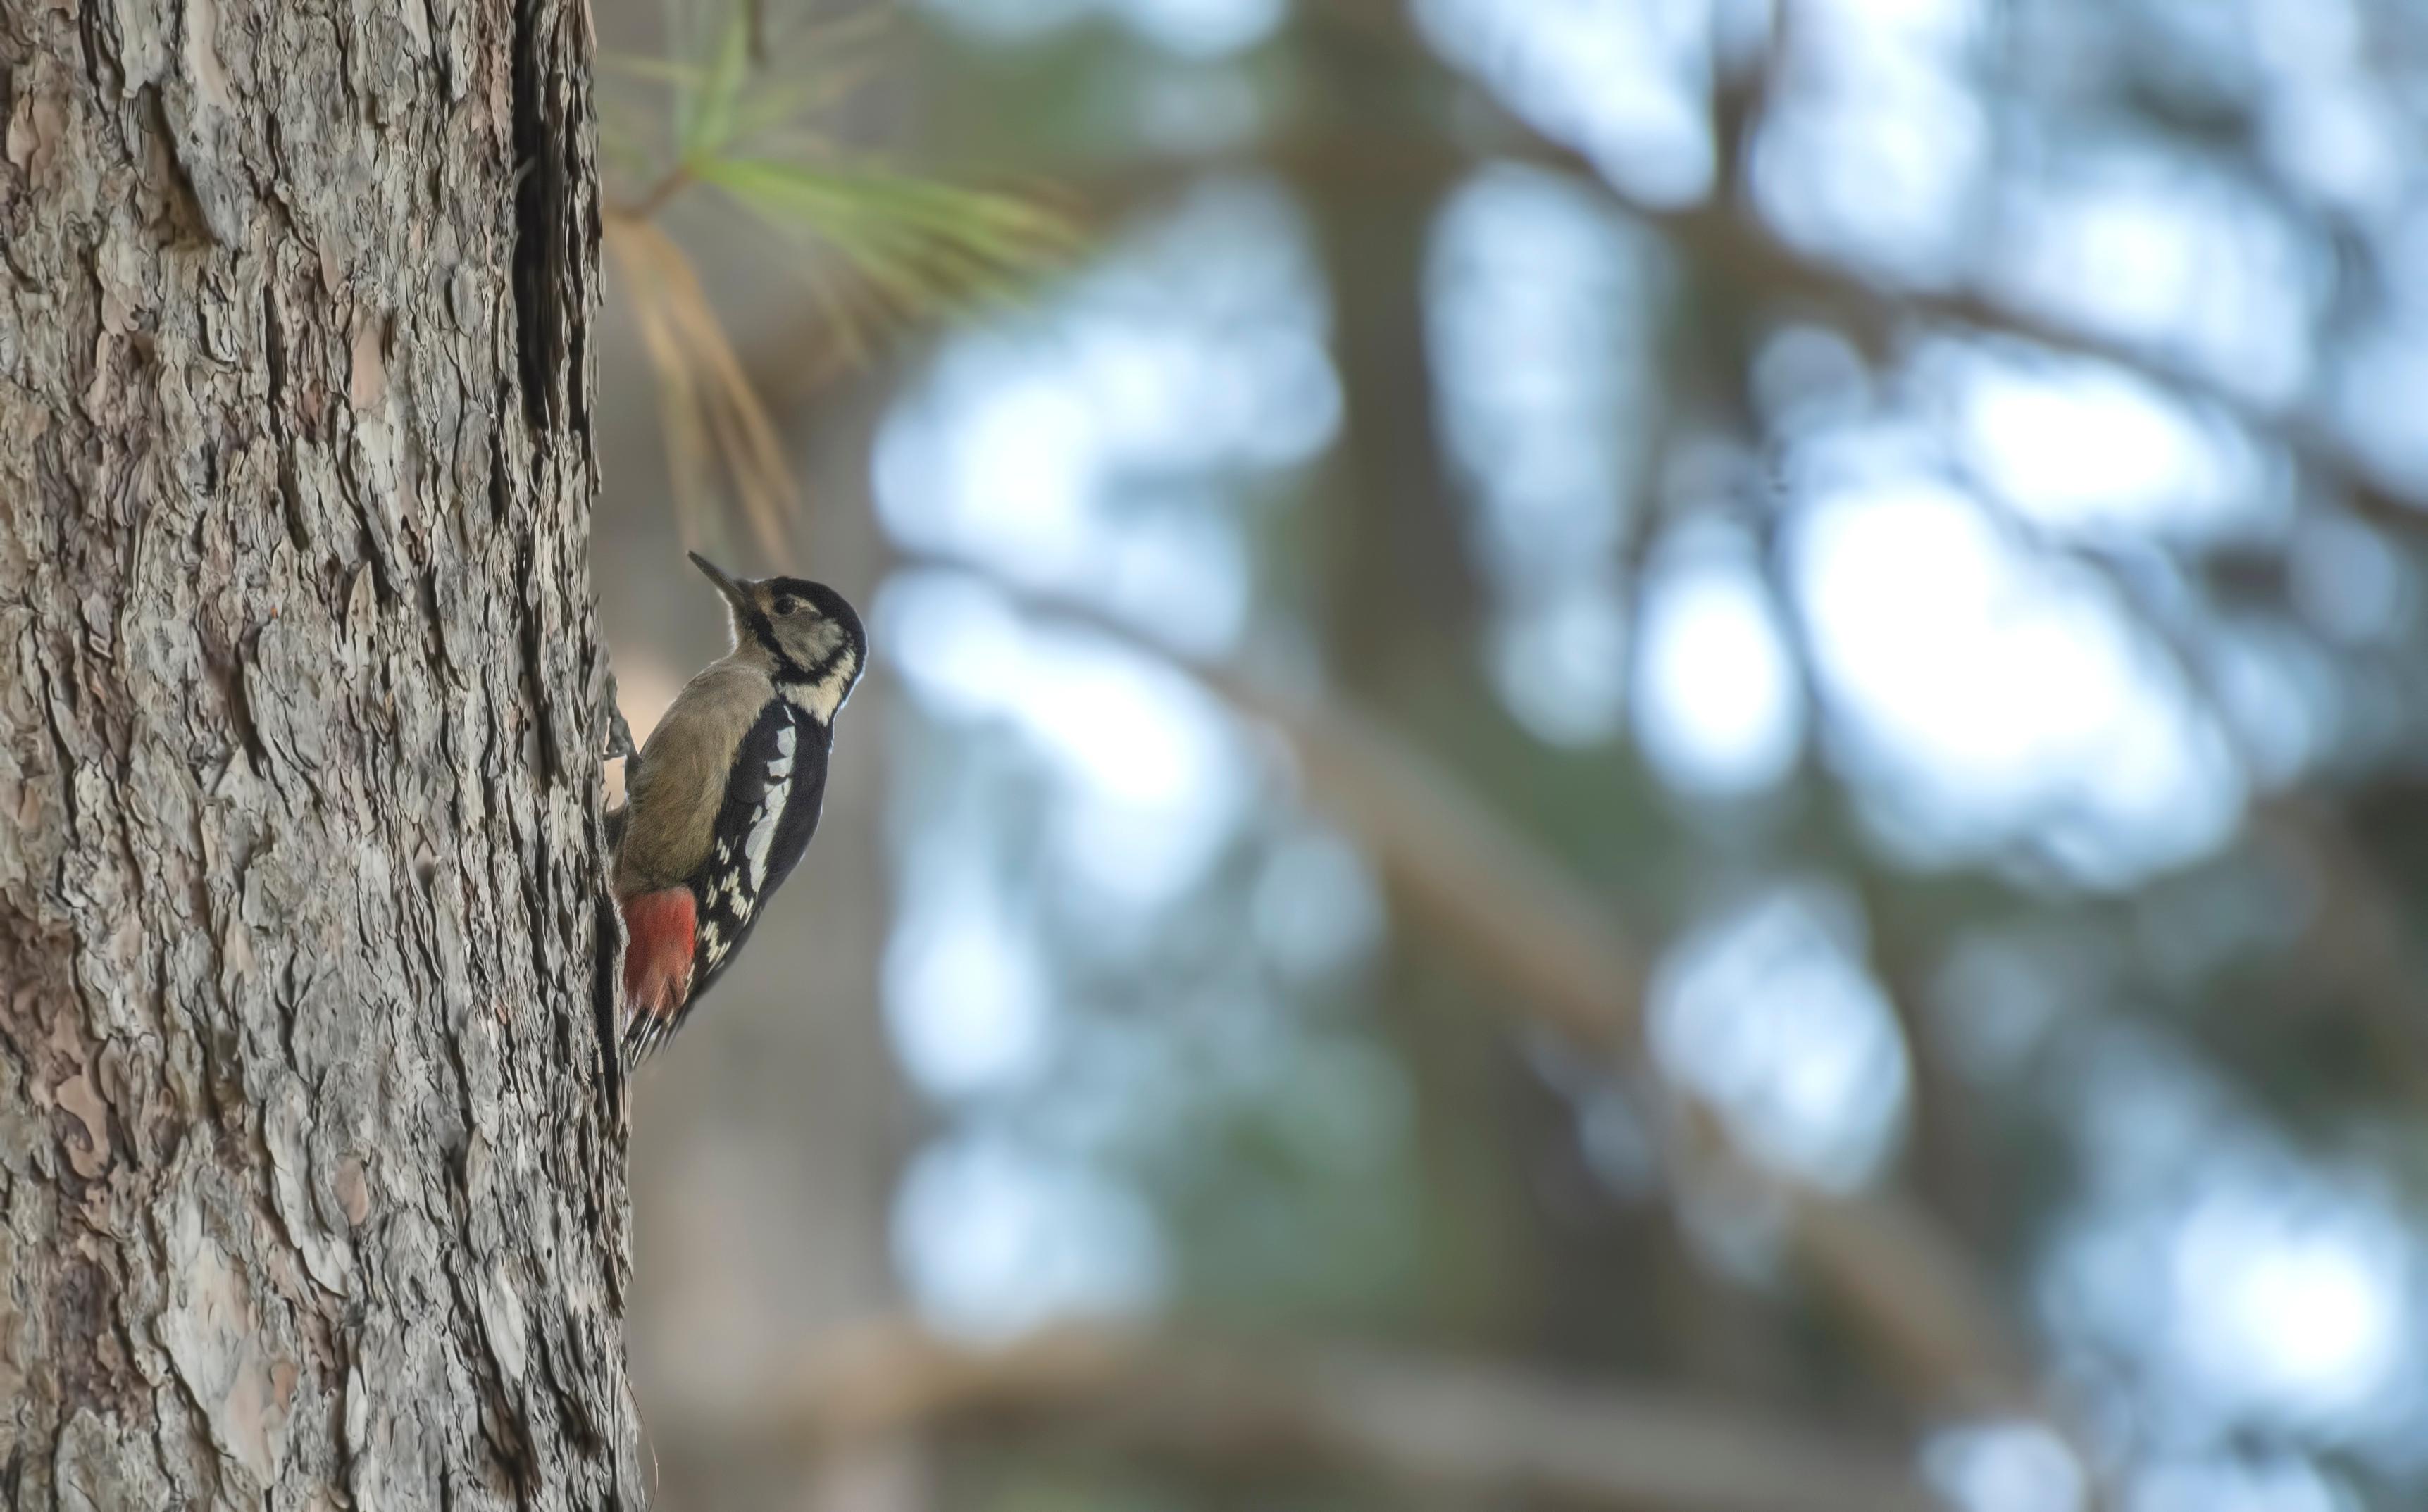 Woodpecker on pine tree